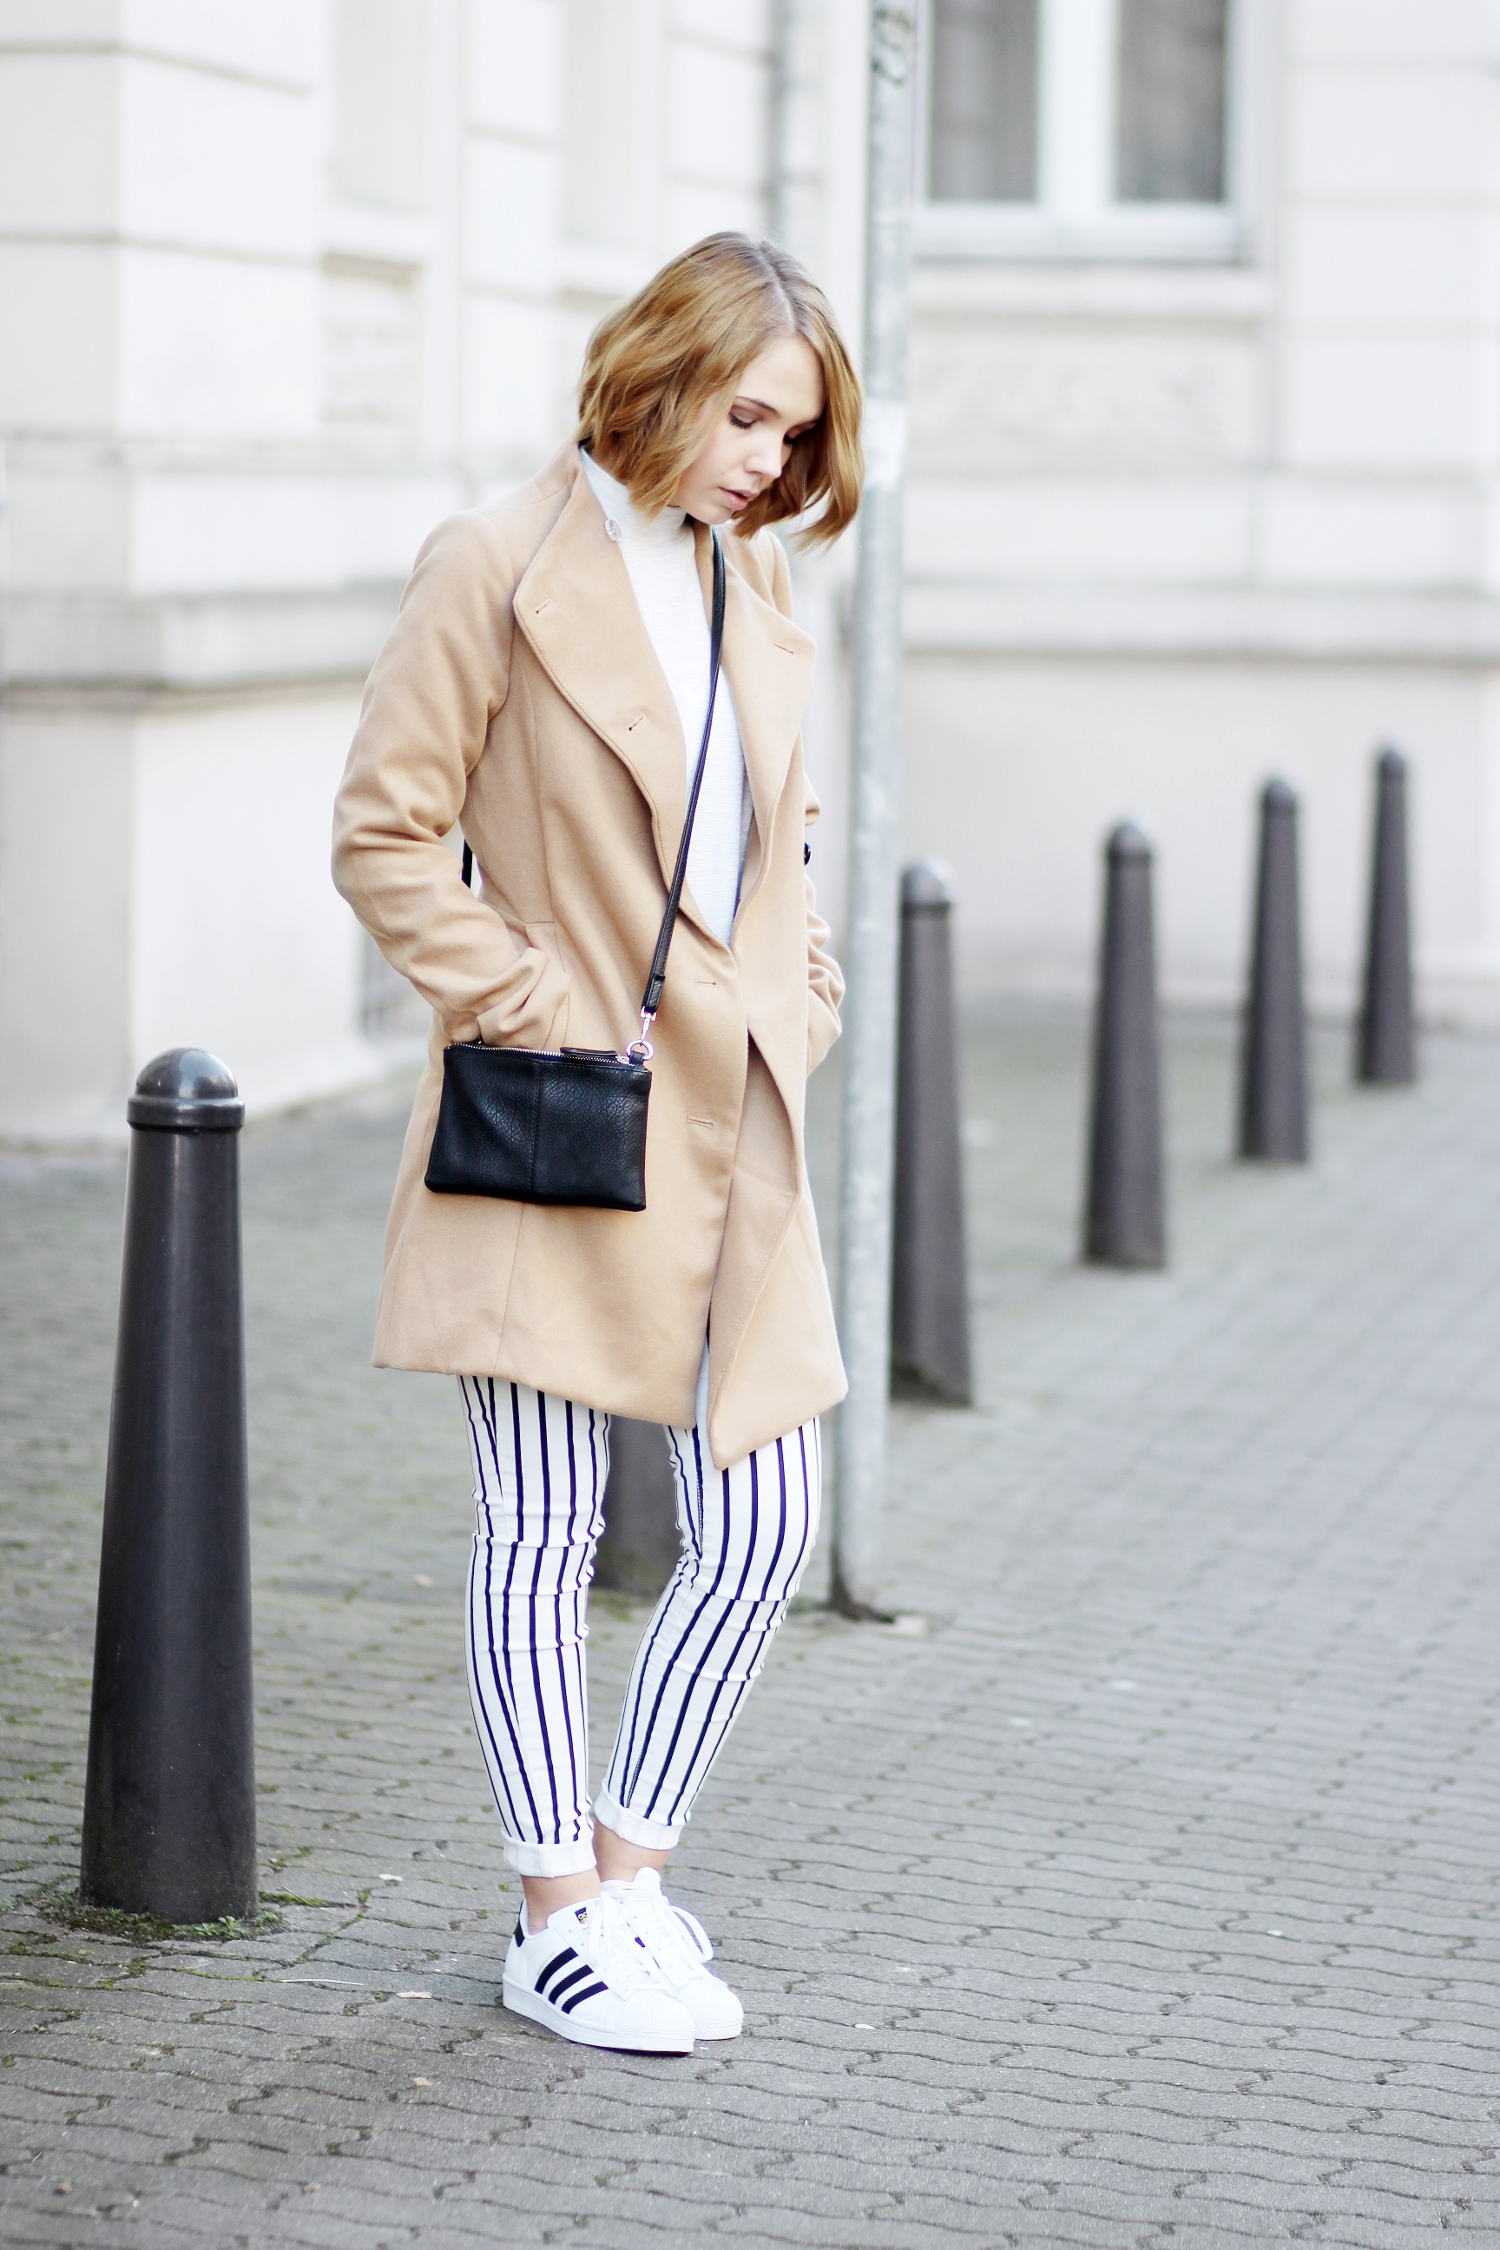 bezauberndenana-fashionblog-outfit-streetstyle-streifen-hose-mango-camel-mantel-adidas-superstars-casual (13)